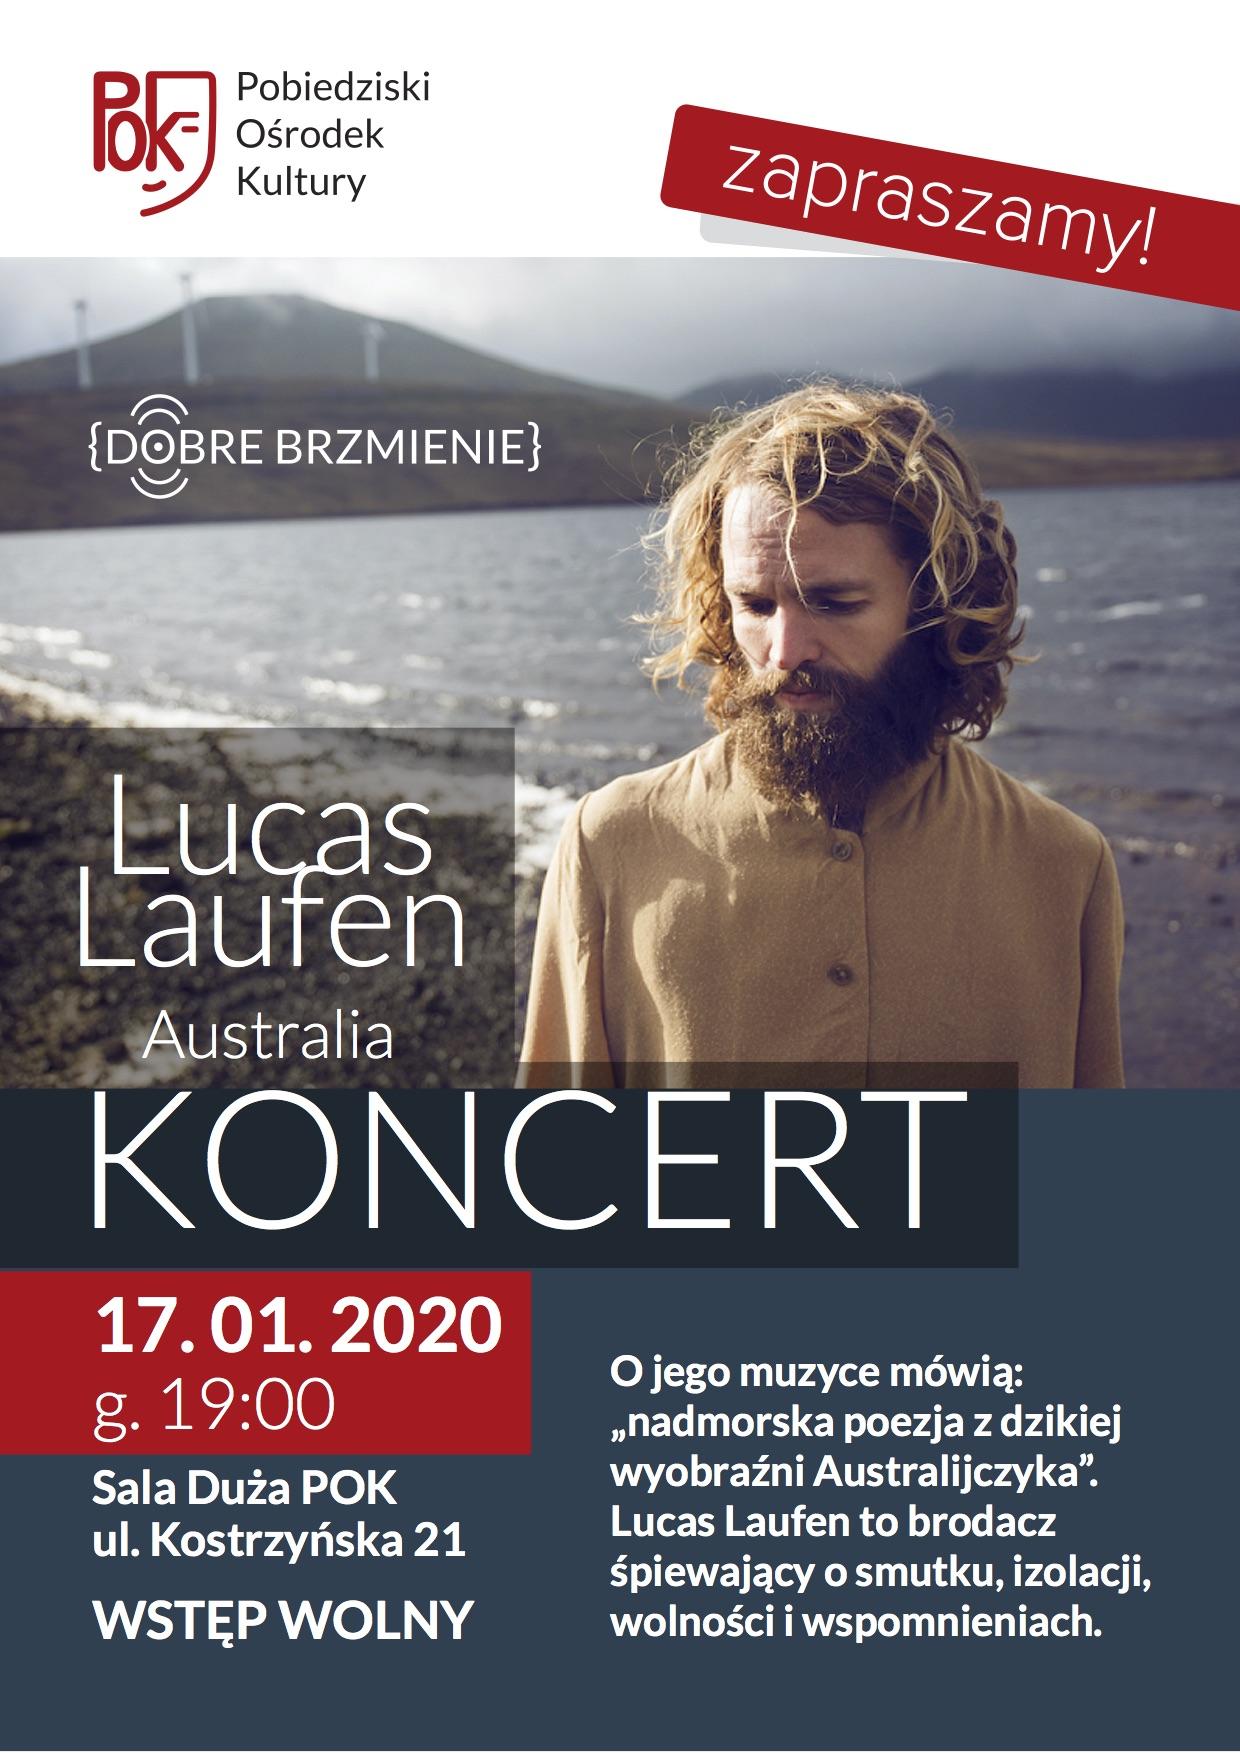 KONCERT LICAS LAUFEN PLAKAT 2020